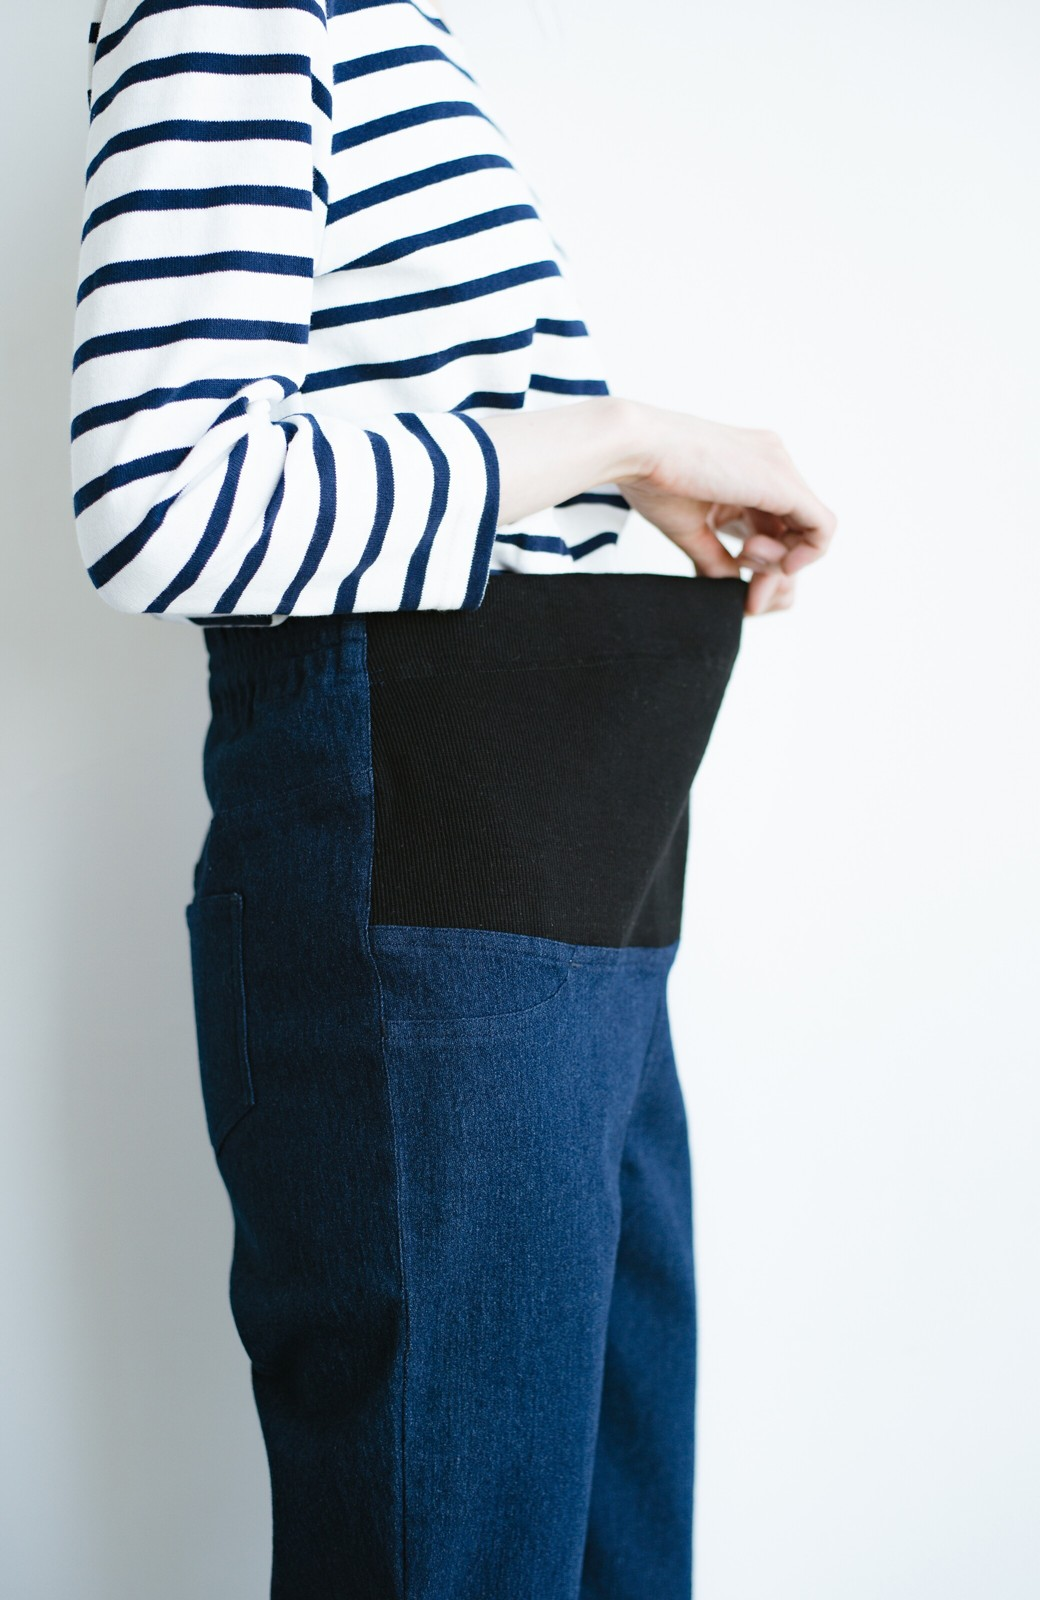 haco! おなかあったか安心感スキニーパンツ【ブルー期】女の子バンザイ!プロジェクト <ダークインディゴブルー>の商品写真3